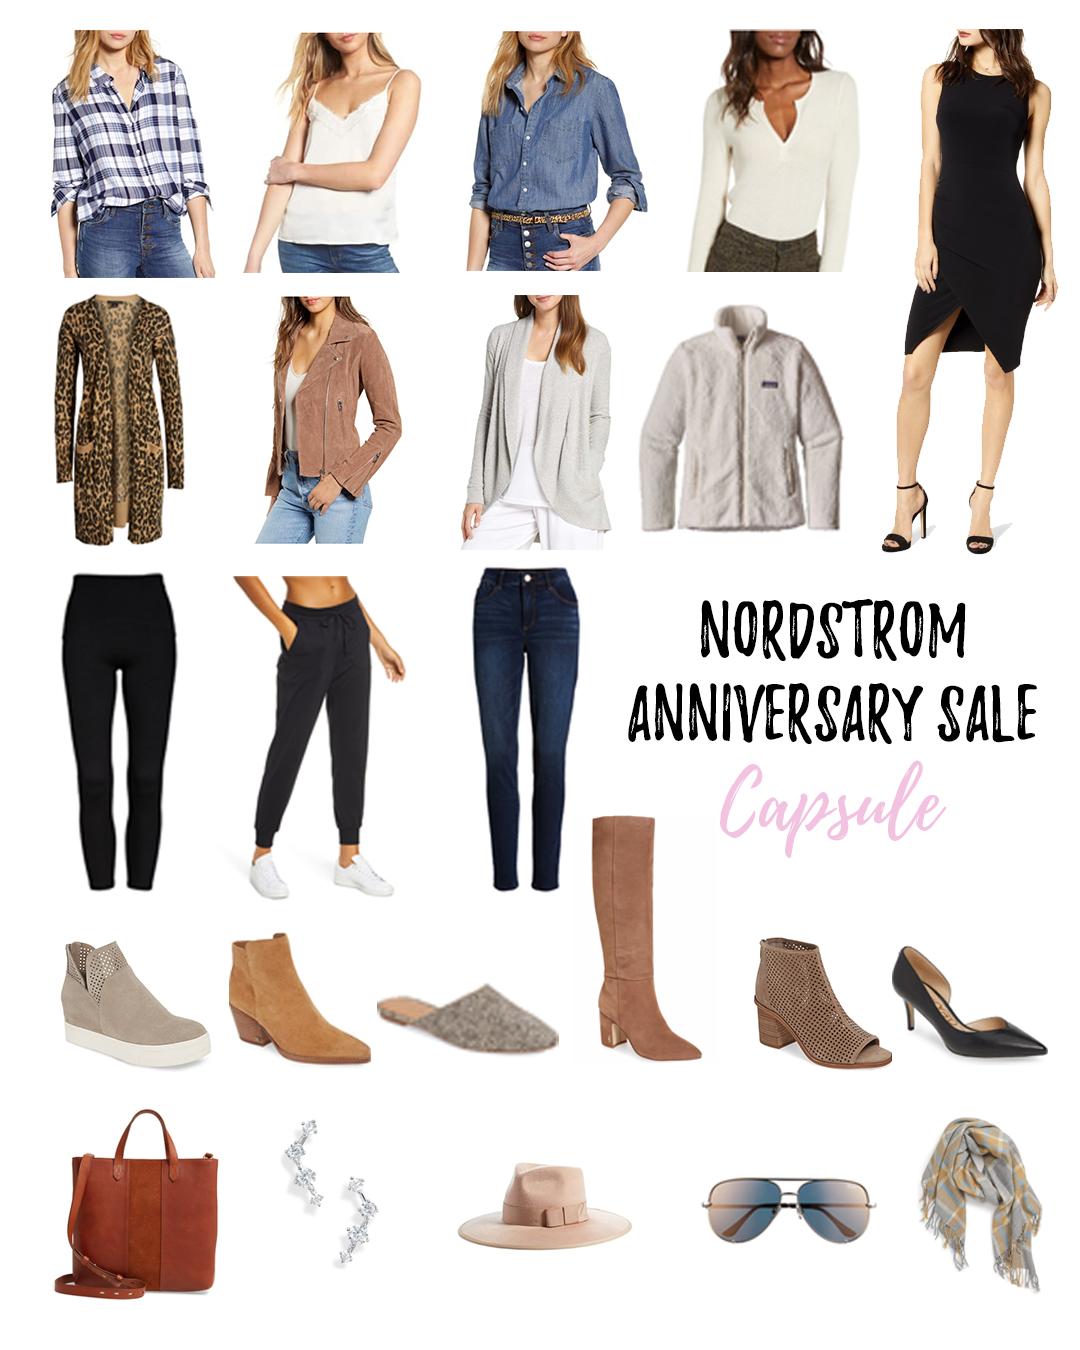 nordstrom anniversary sale 2019 fall capsule wardrobe - pinteresting plans blog